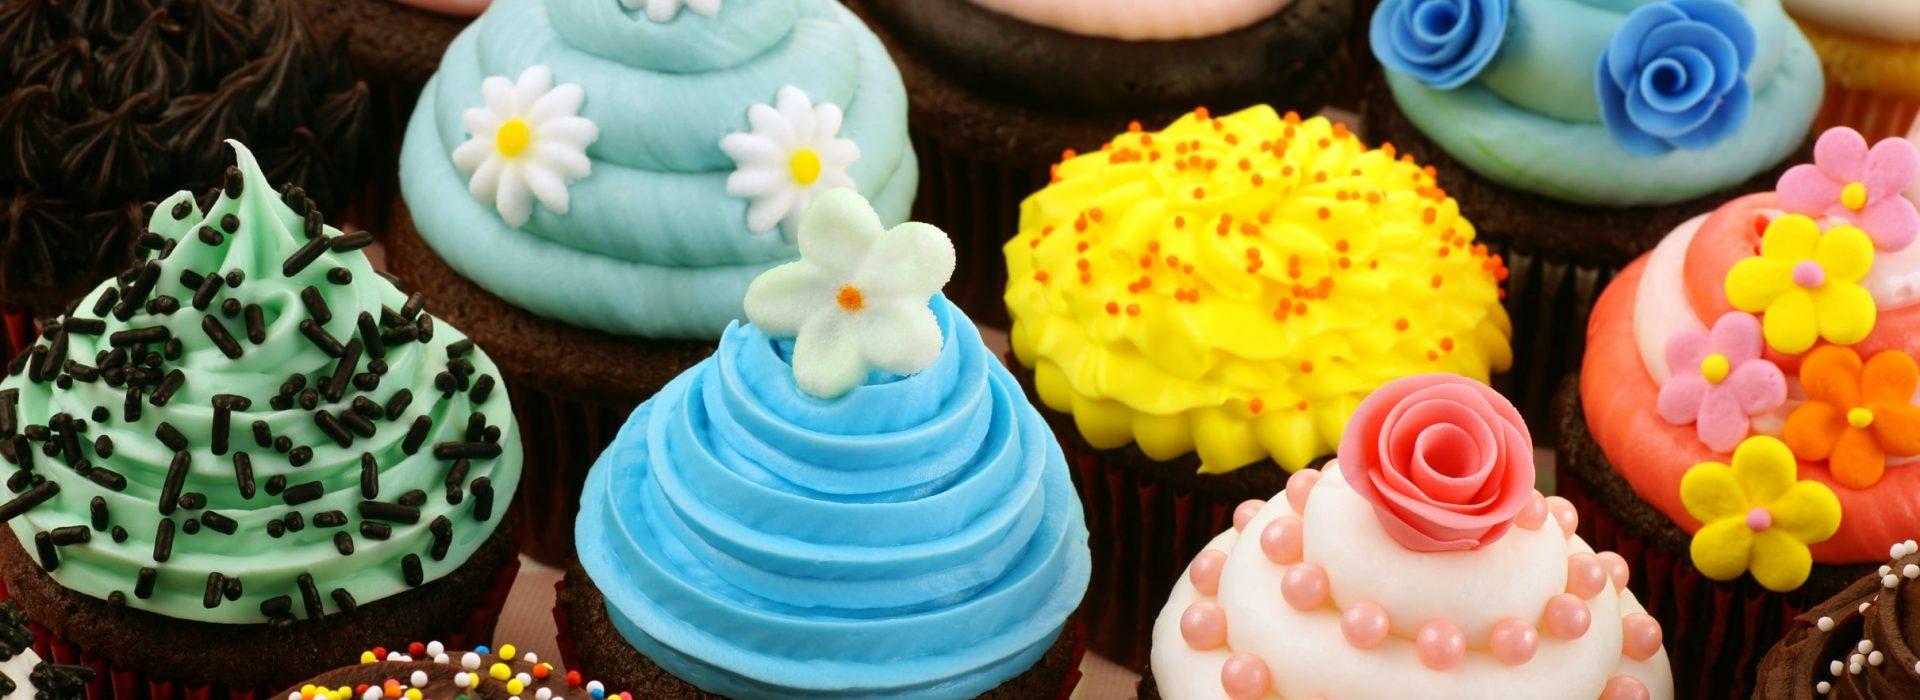 Chocolate Cupcakes - Dessert Advisor